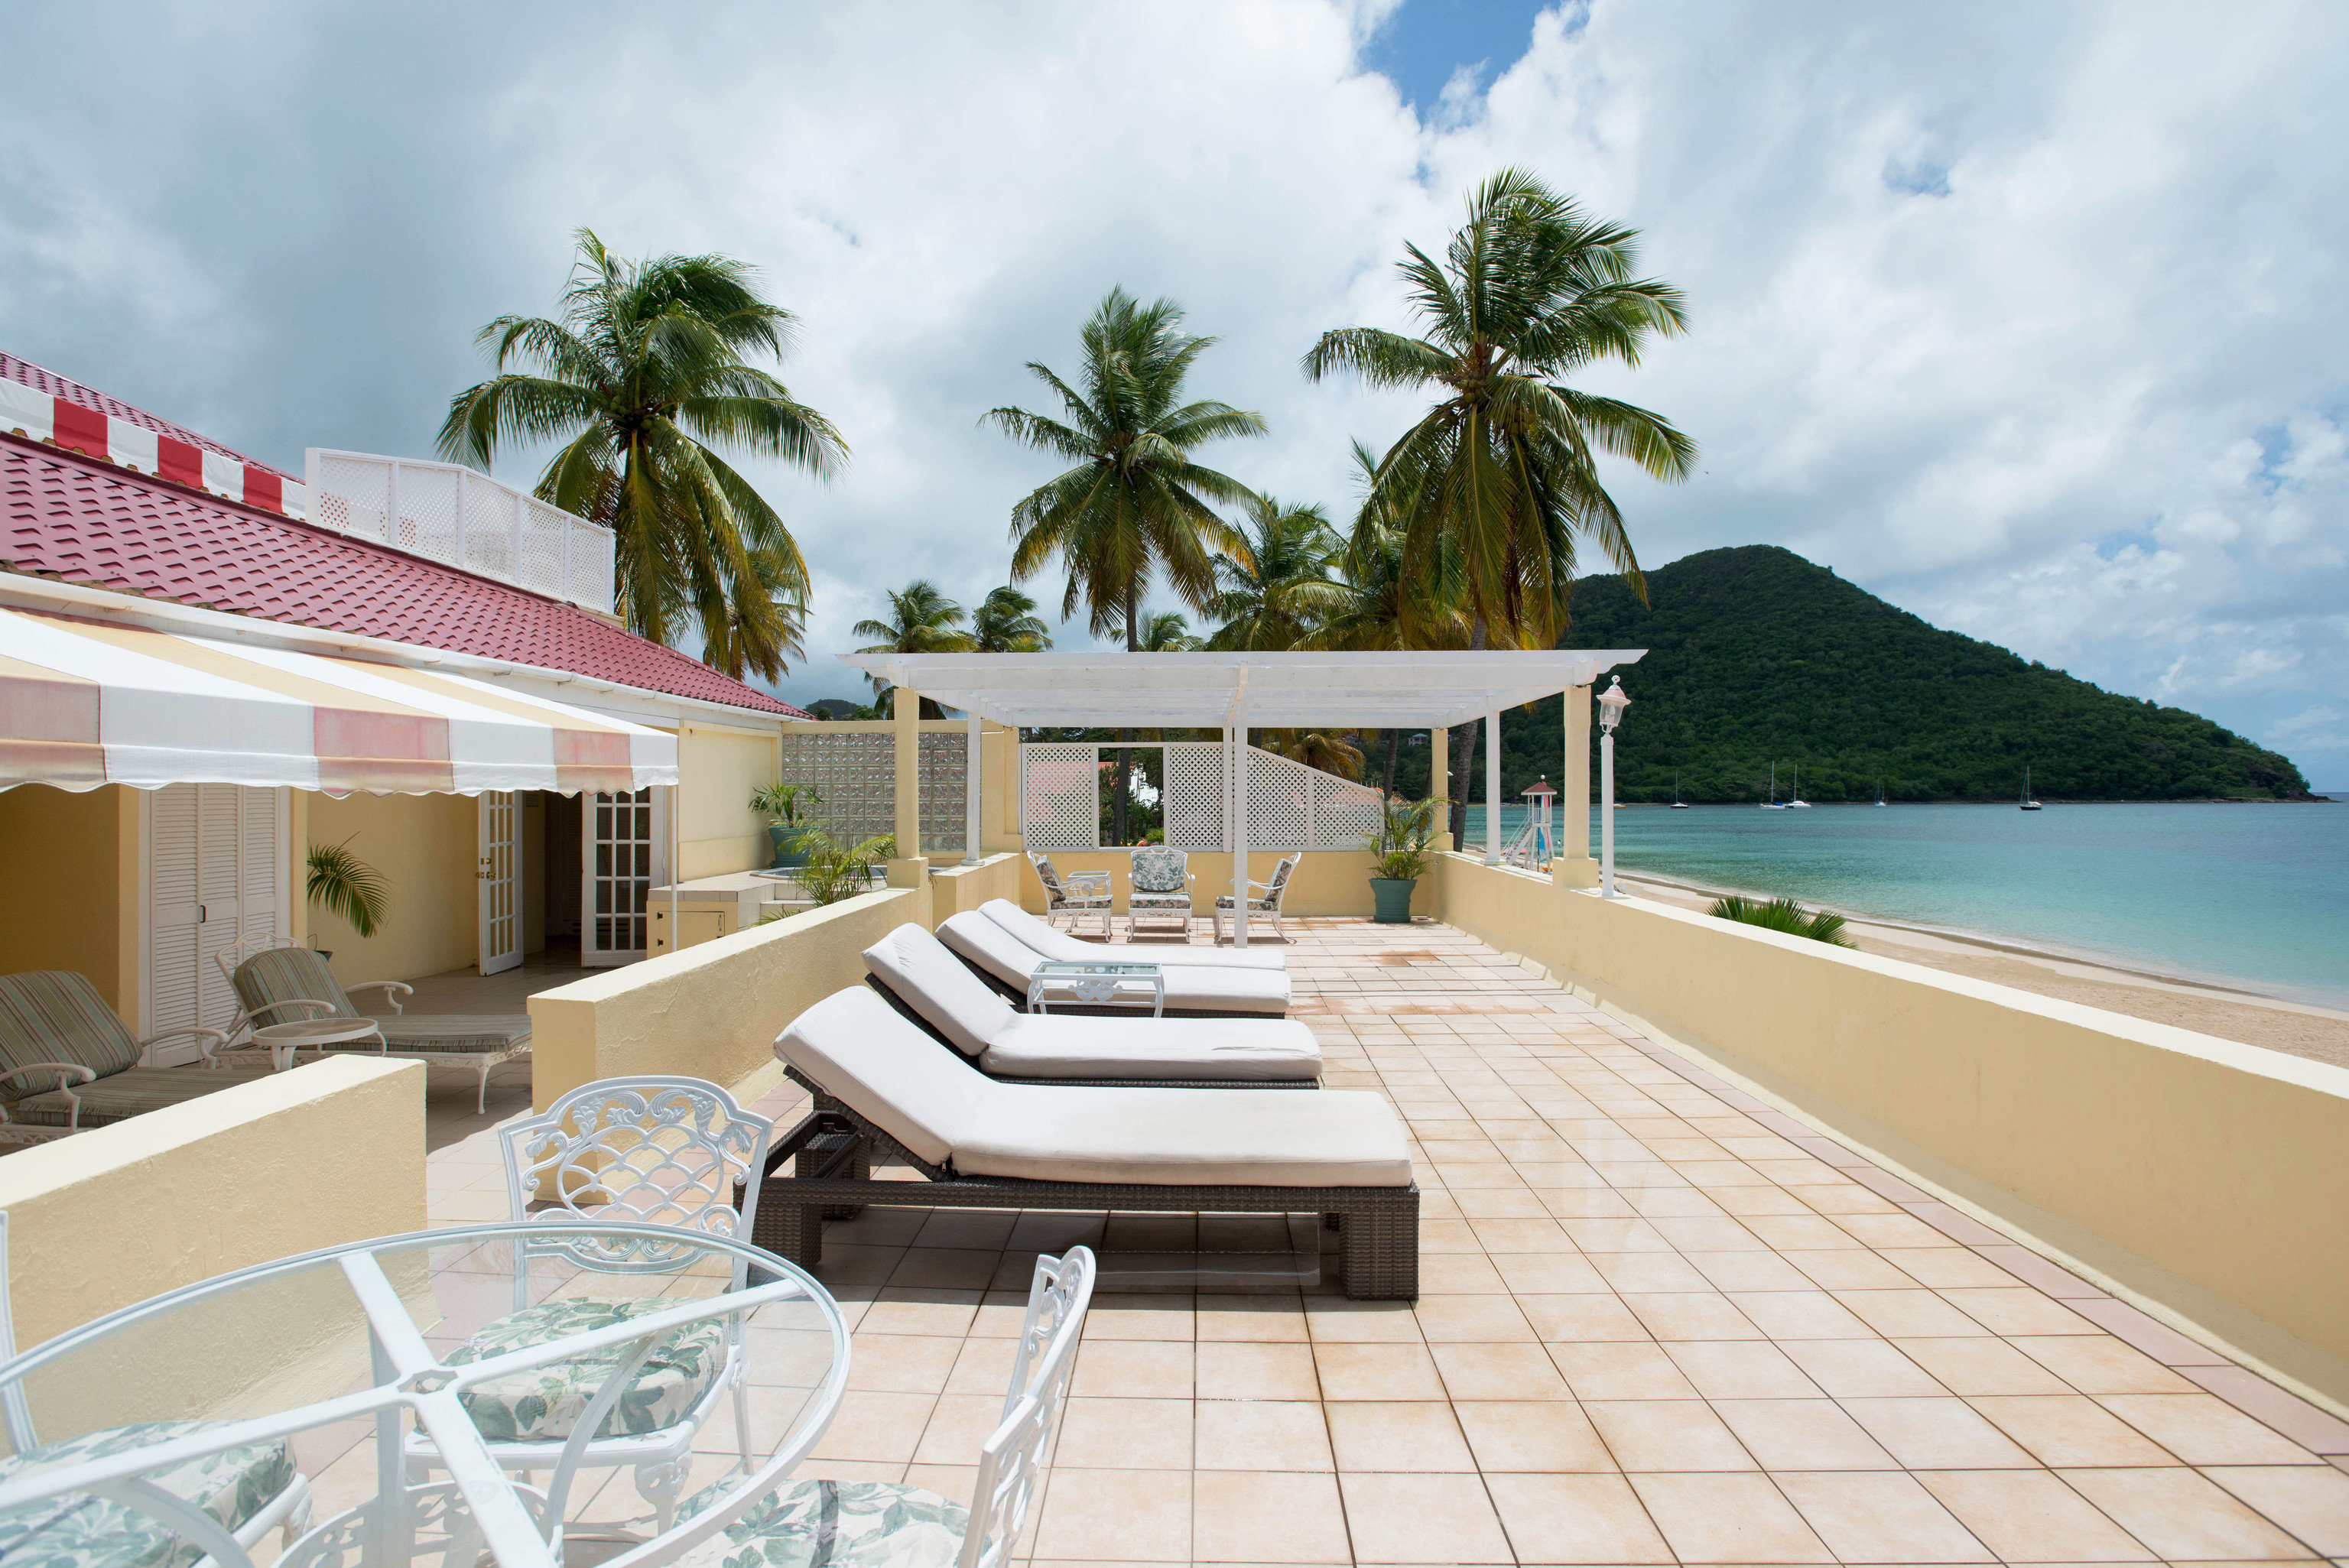 sky property swimming pool leisure Villa Resort house condominium caribbean home mansion Deck